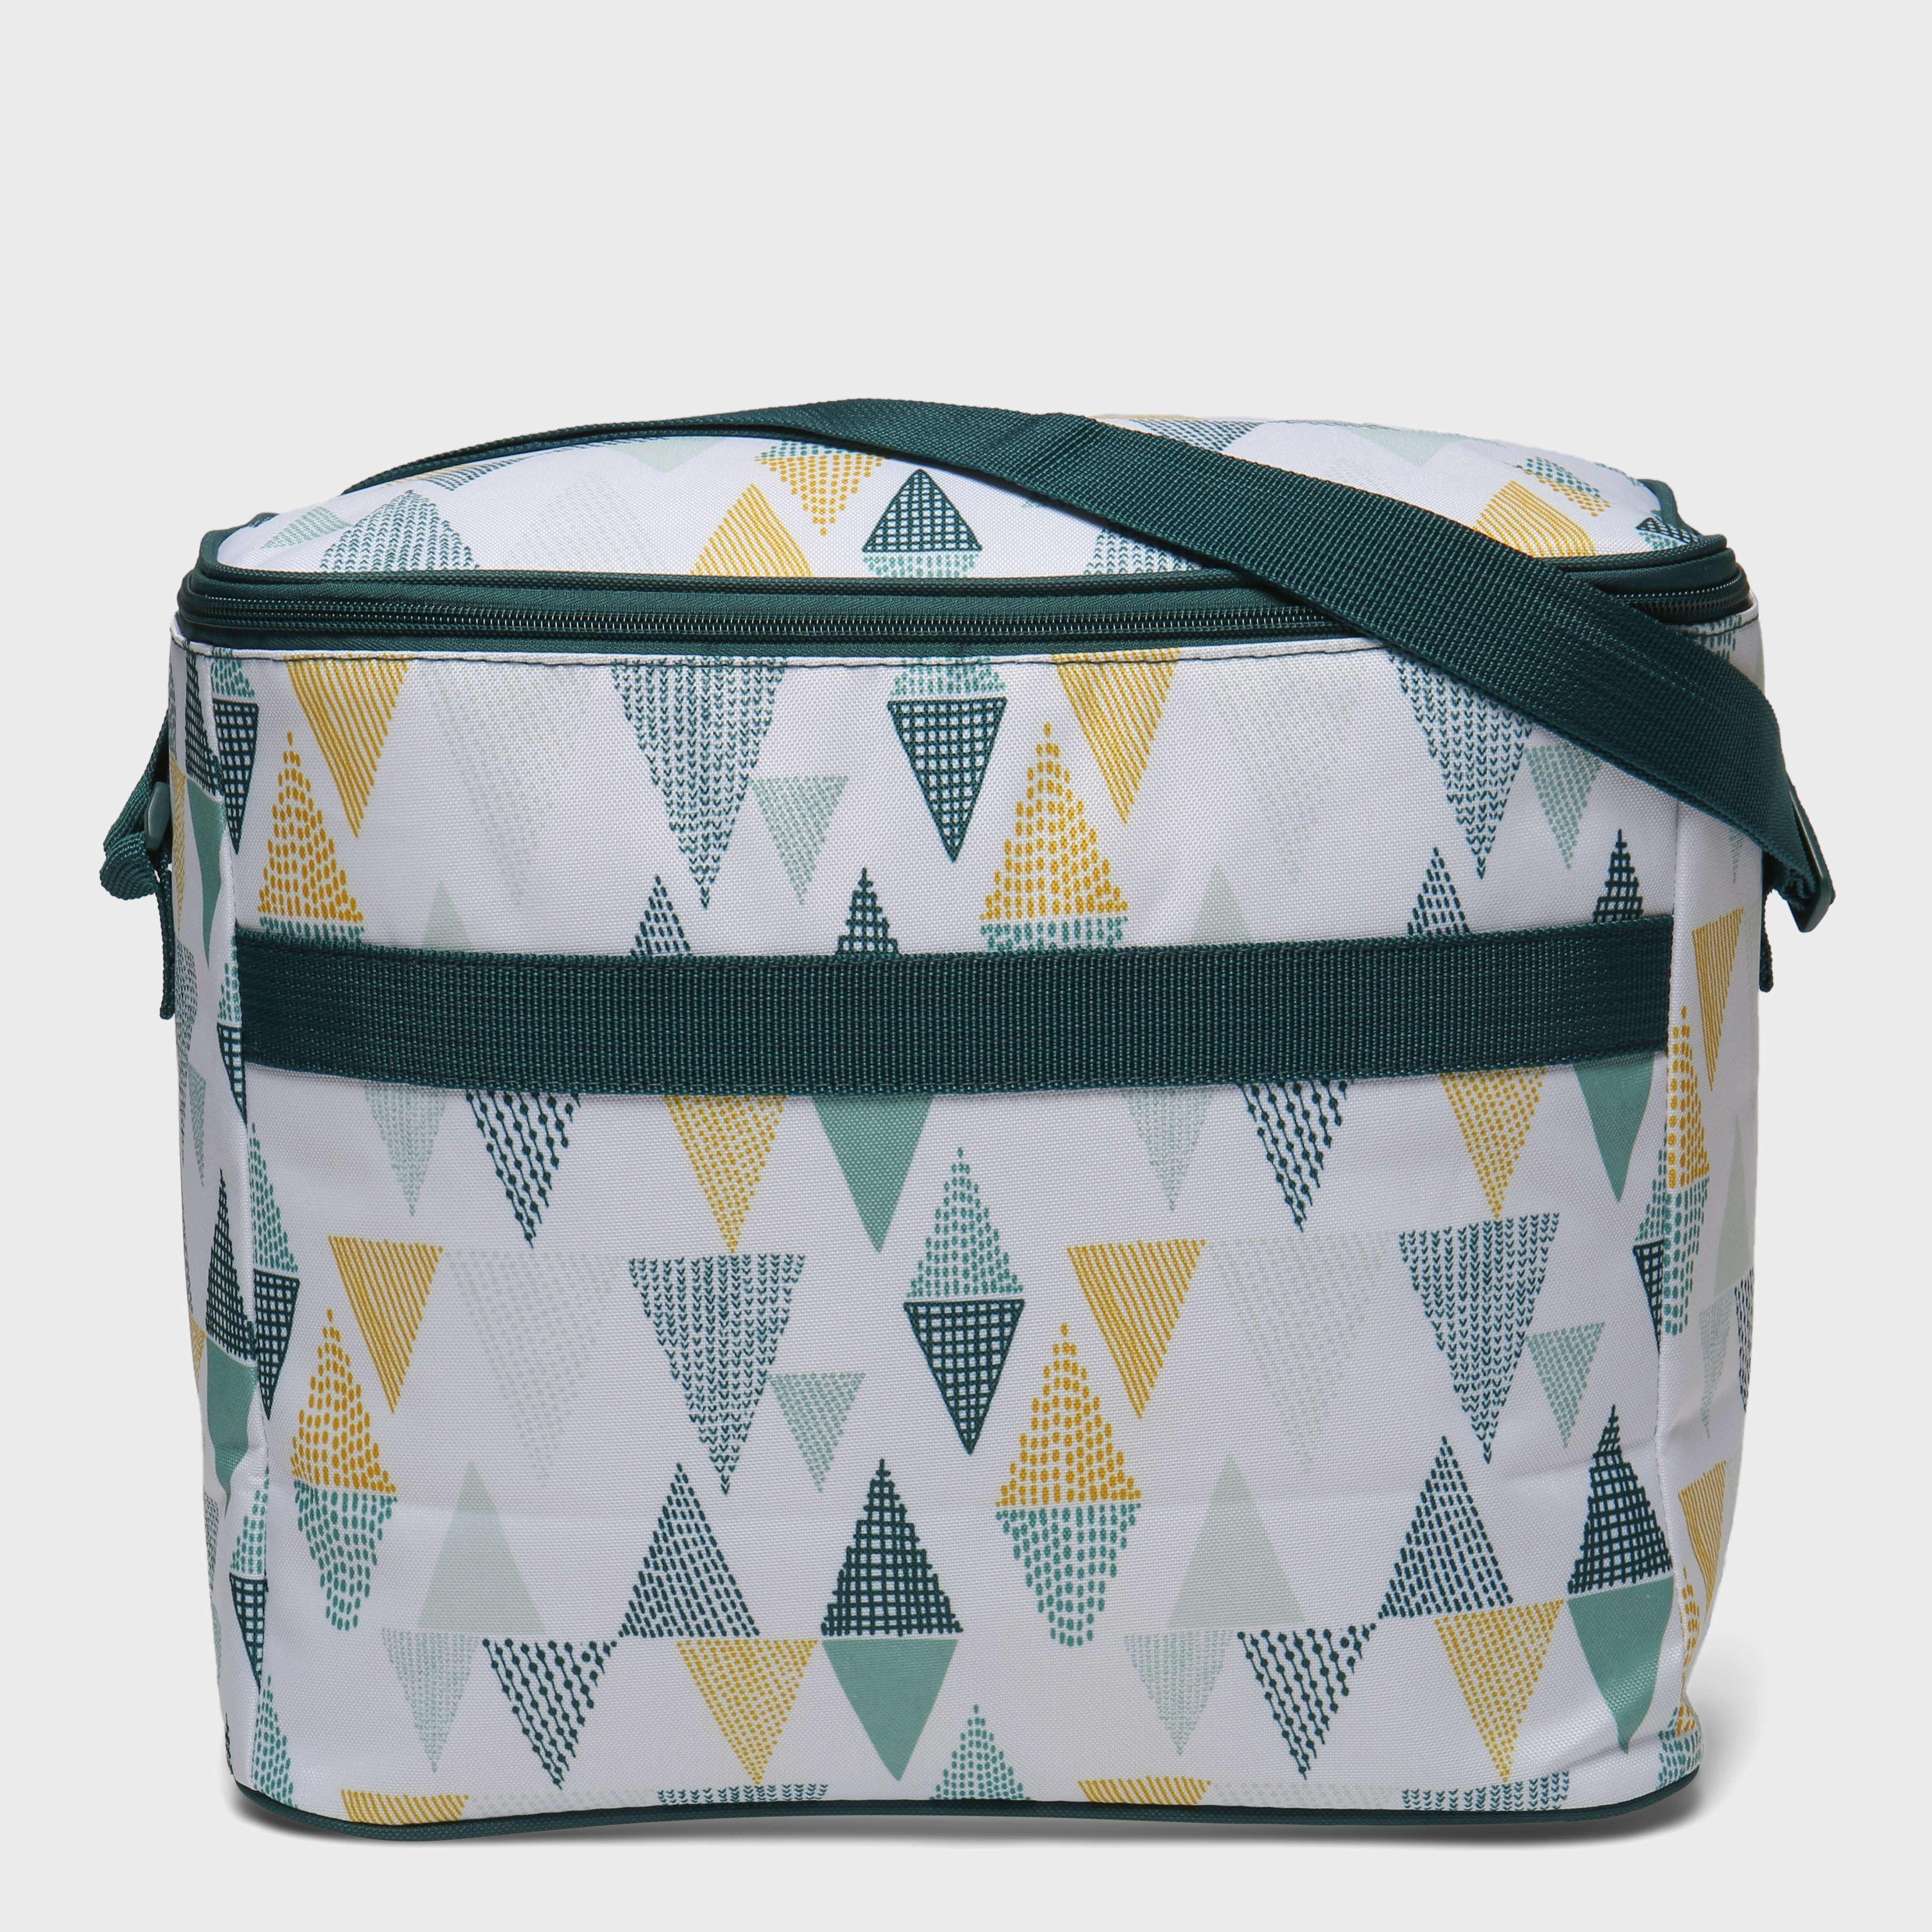 EUROHIKE Cooler Bag (Medium)